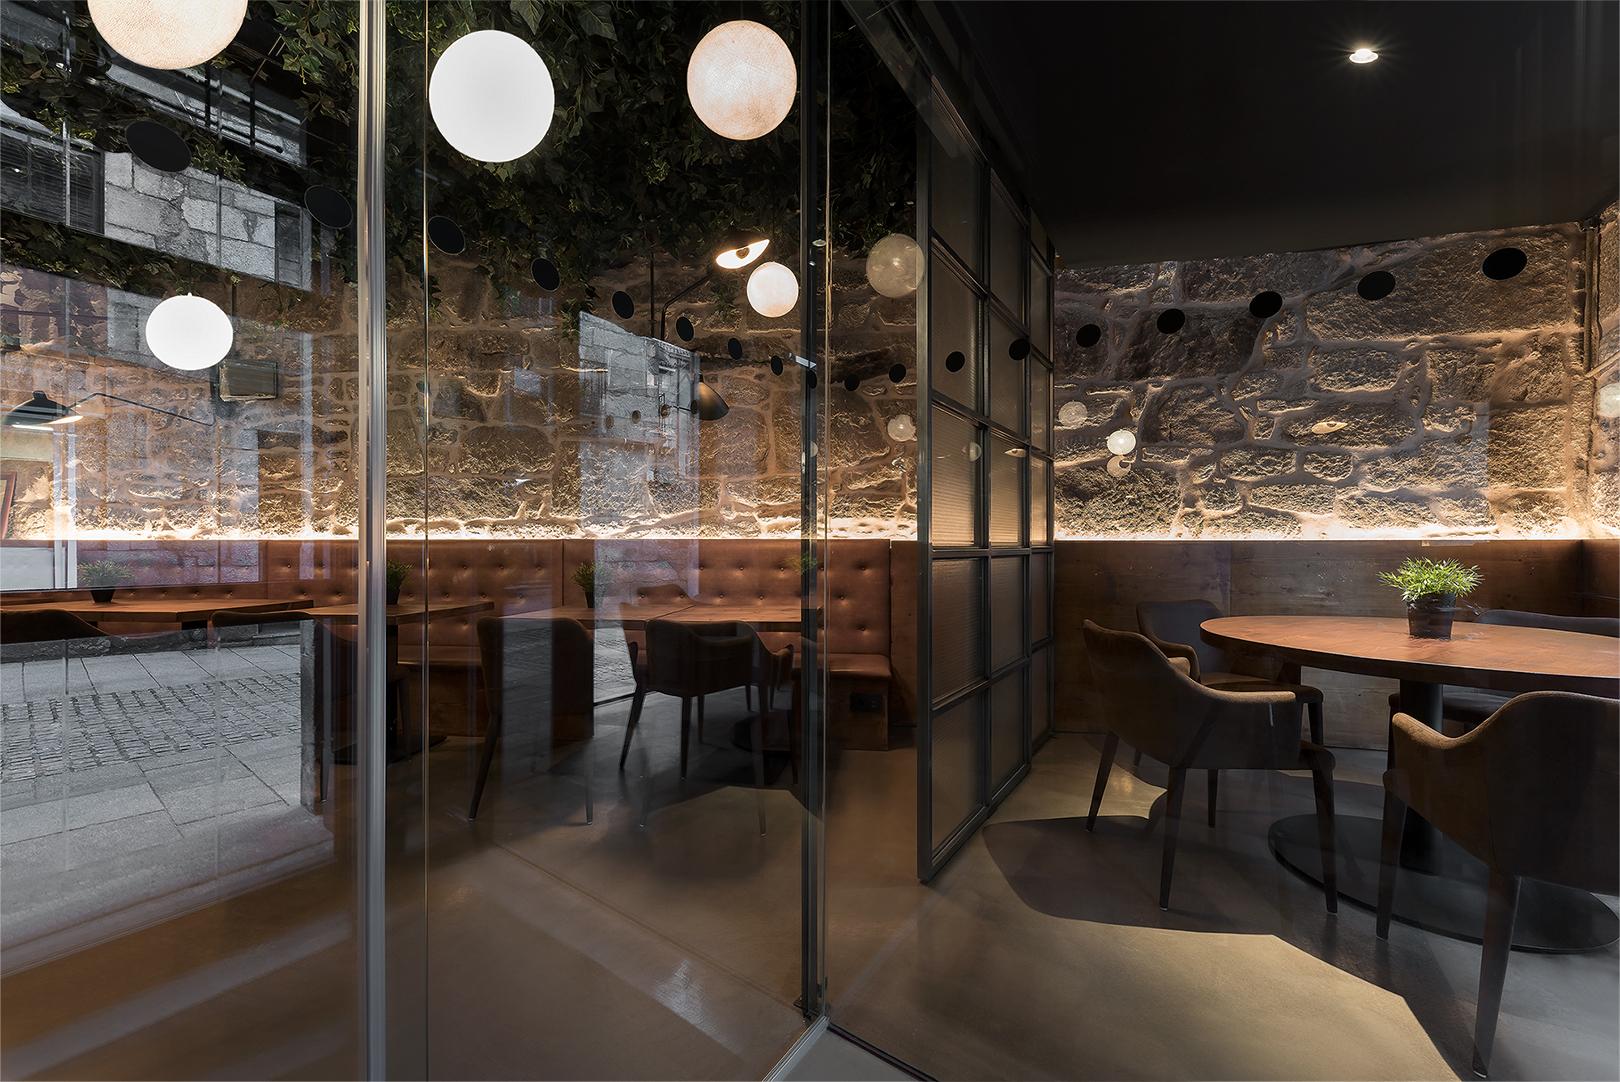 Galer A De Restaurante Taberna Do Trasno Nan Arquitectos 3